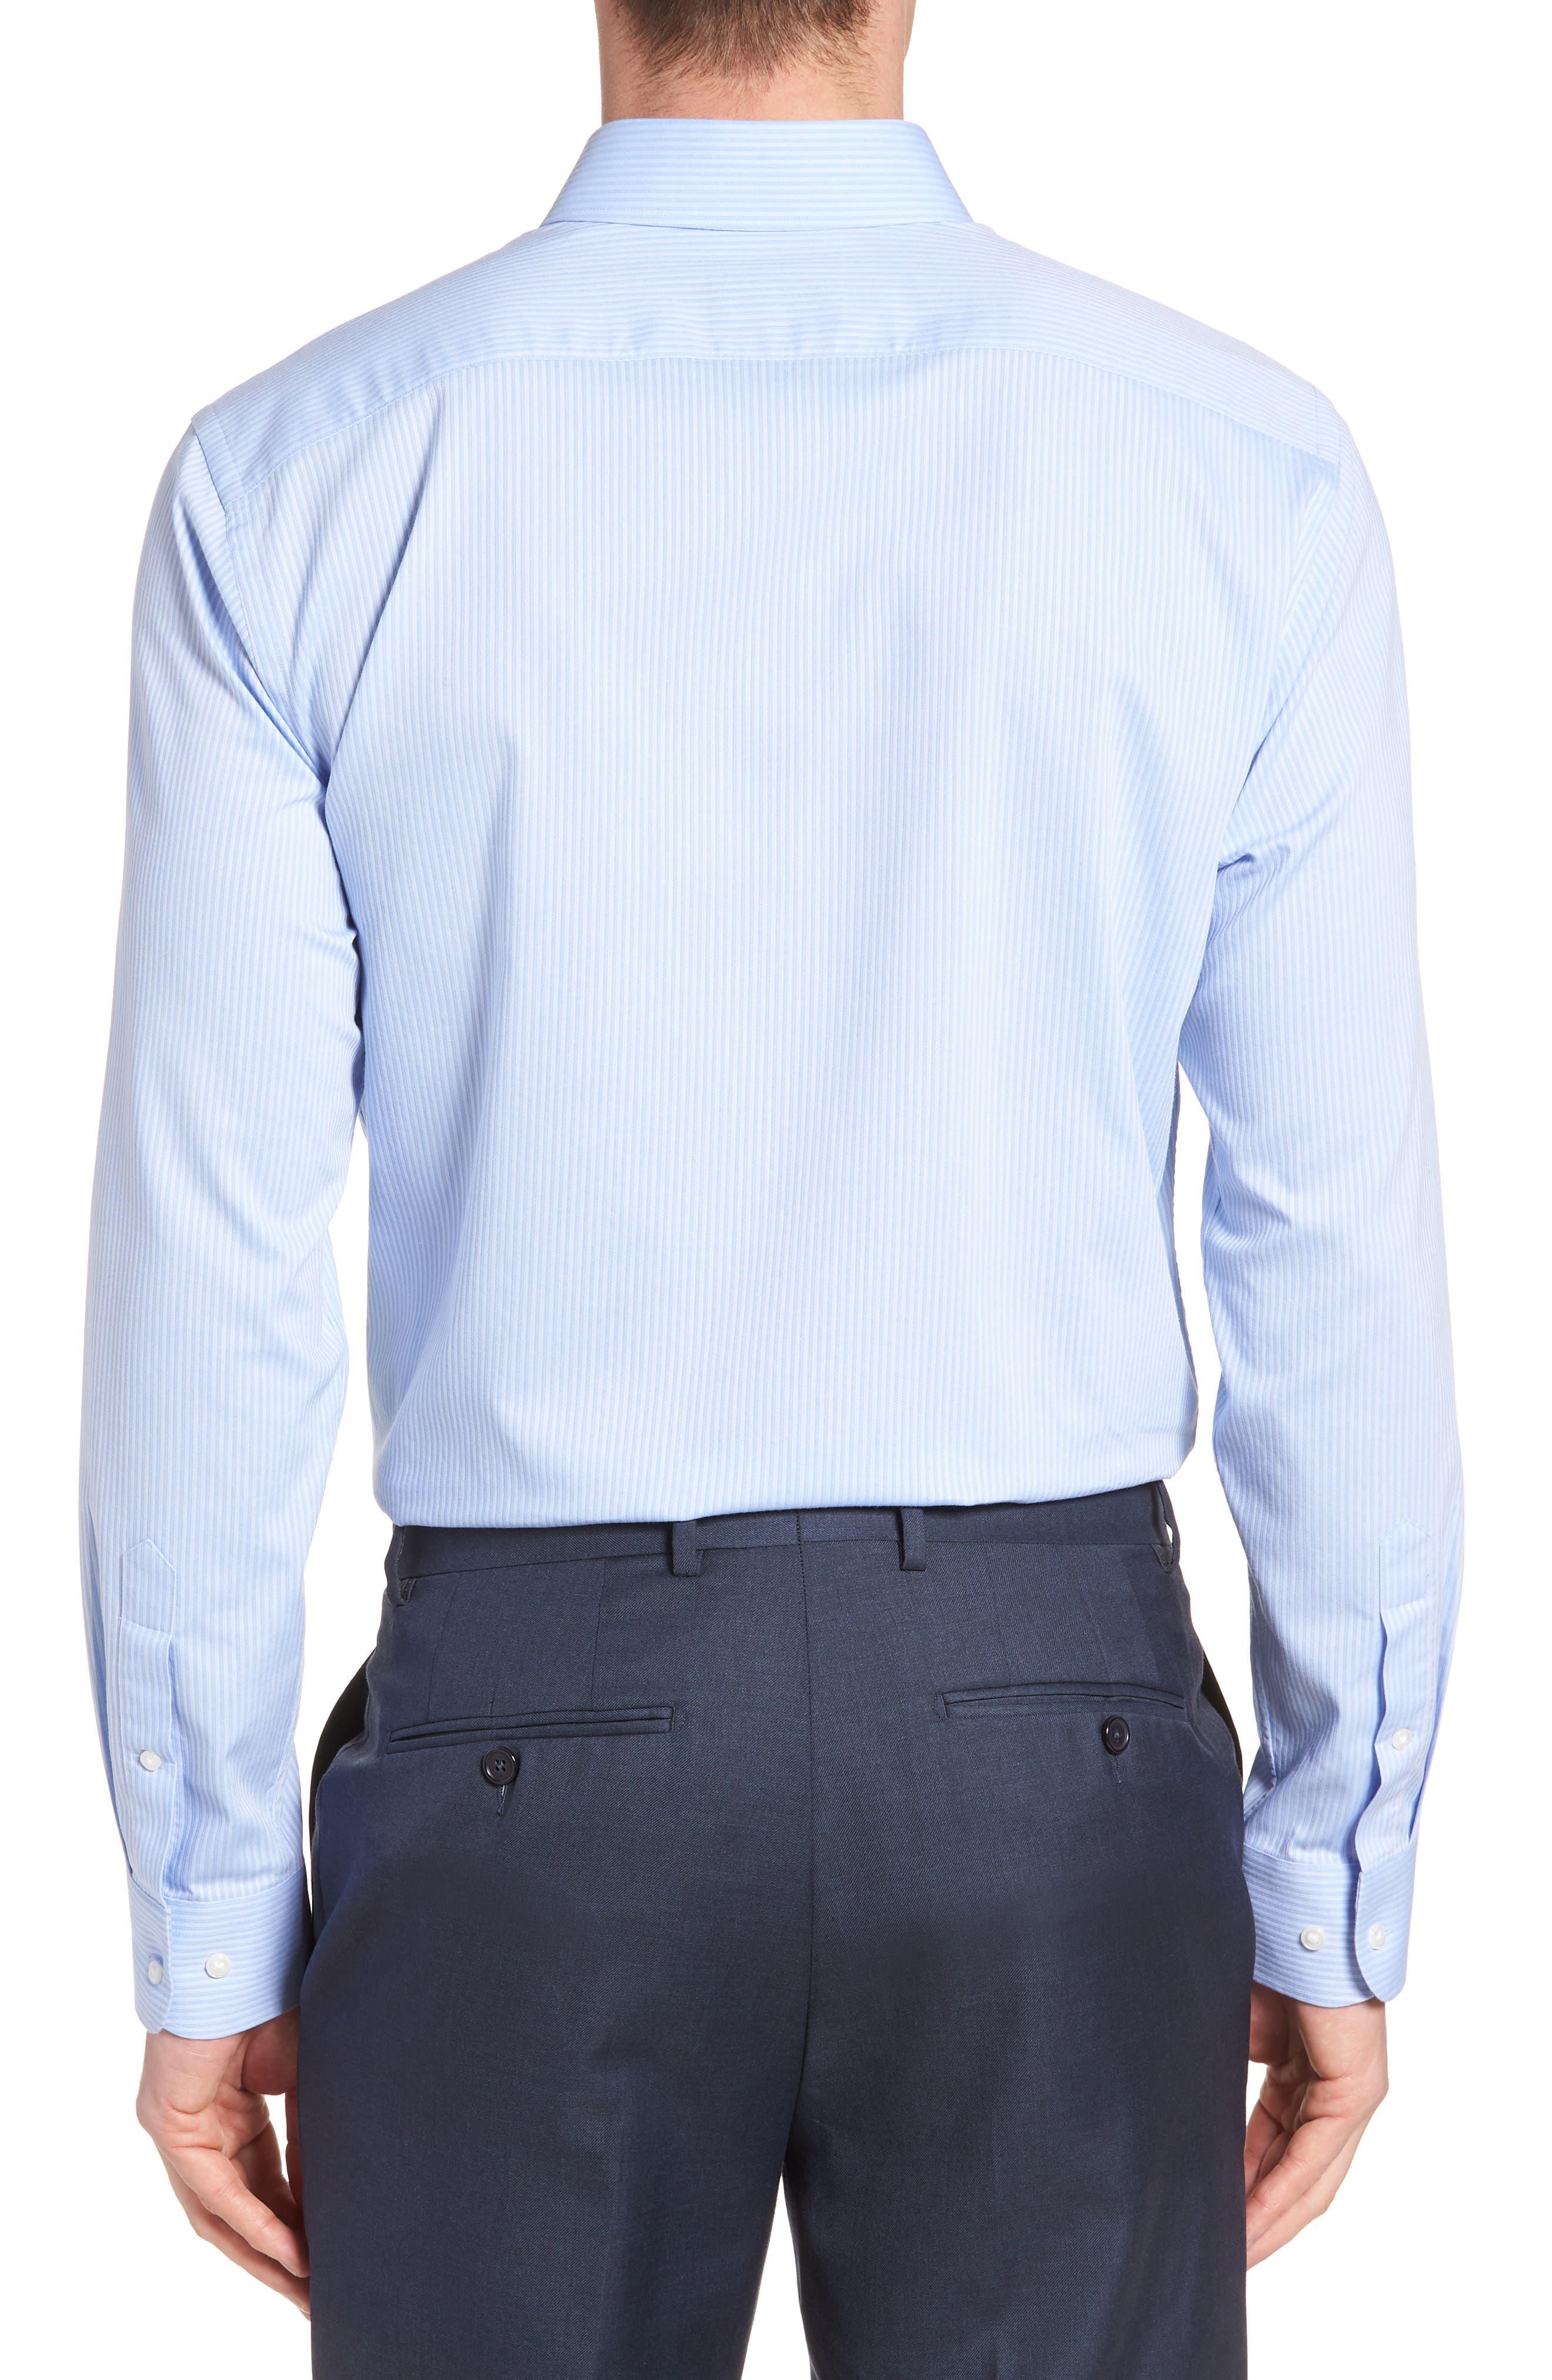 Tech-Smart Trim Fit Stretch Stripe Dress Shirt,                             Alternate thumbnail 3, color,                             450